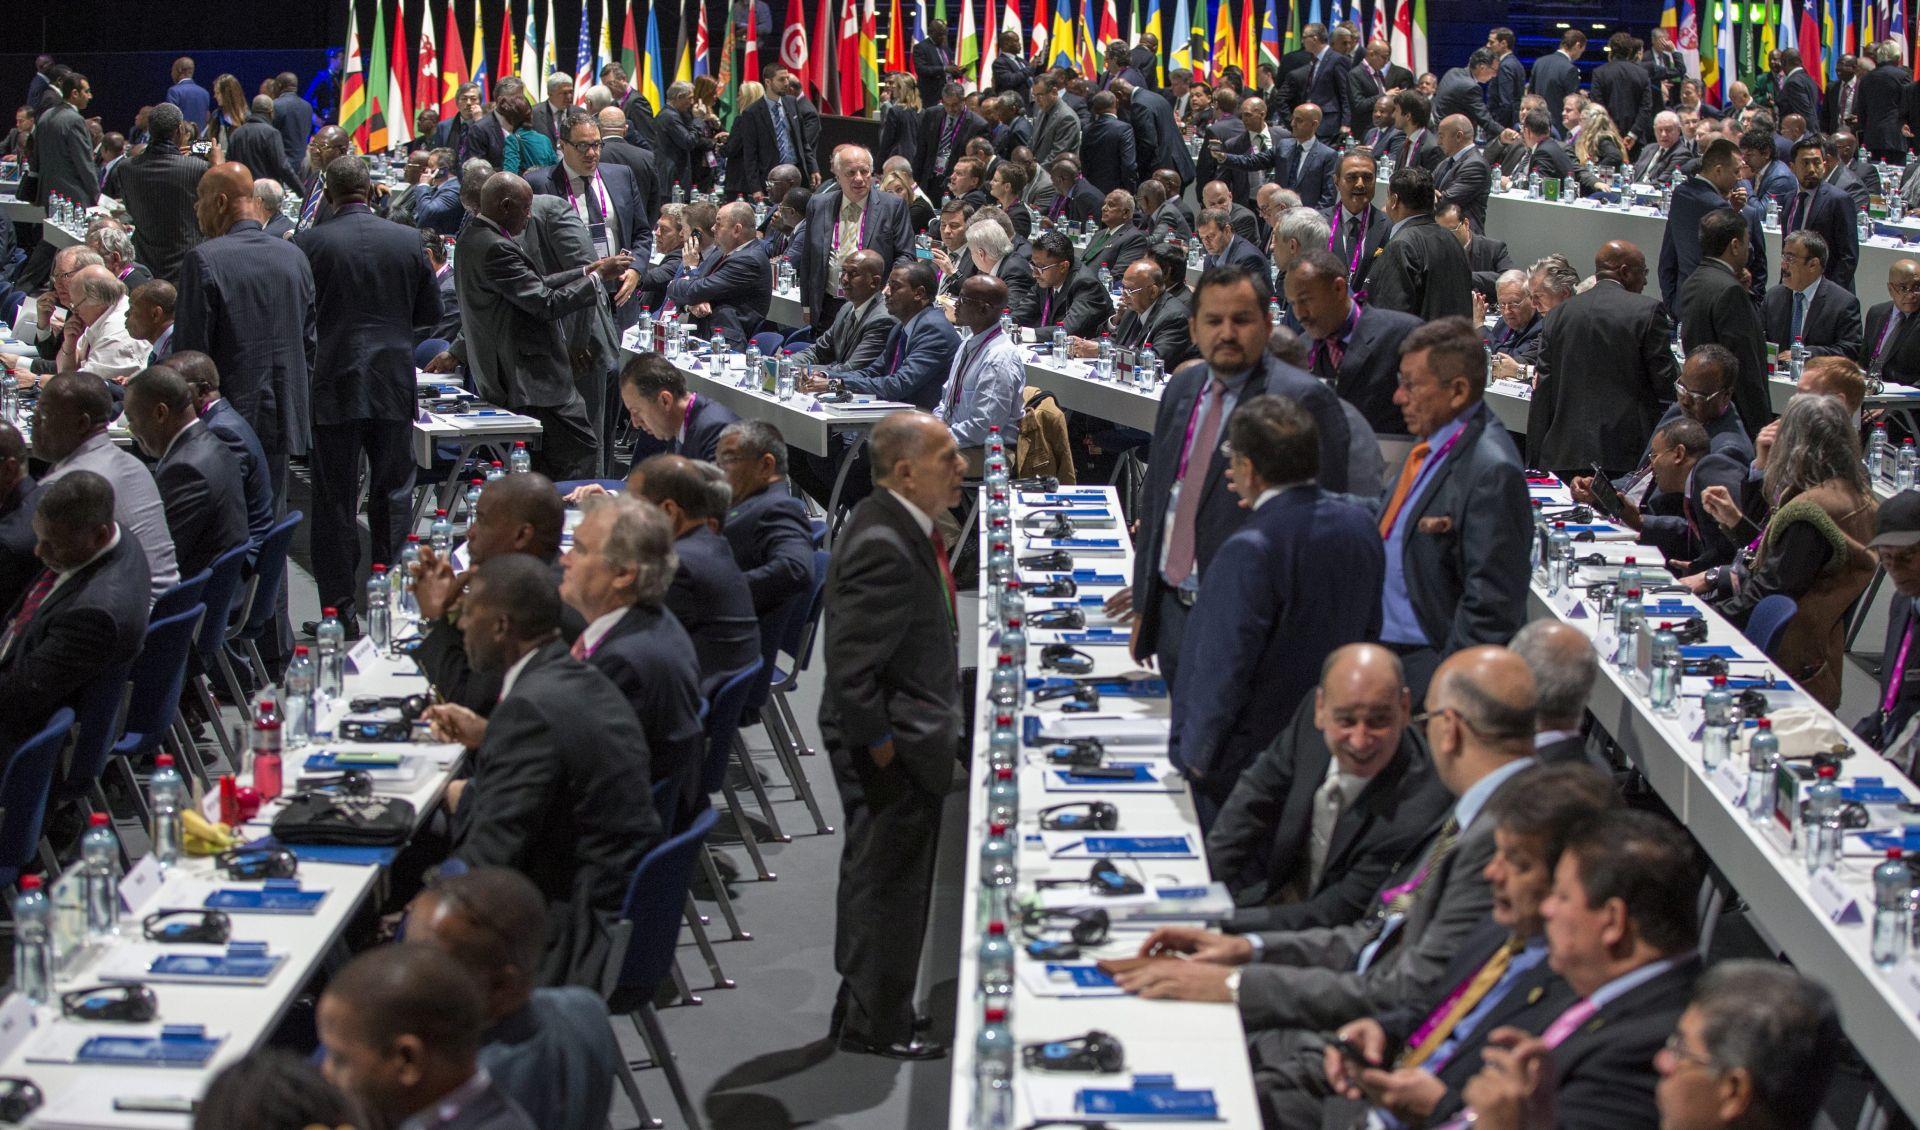 IZVANREDNI KONGRES FIFA-E Uoči izbora za nasljednika Blattera, izglasane reforme